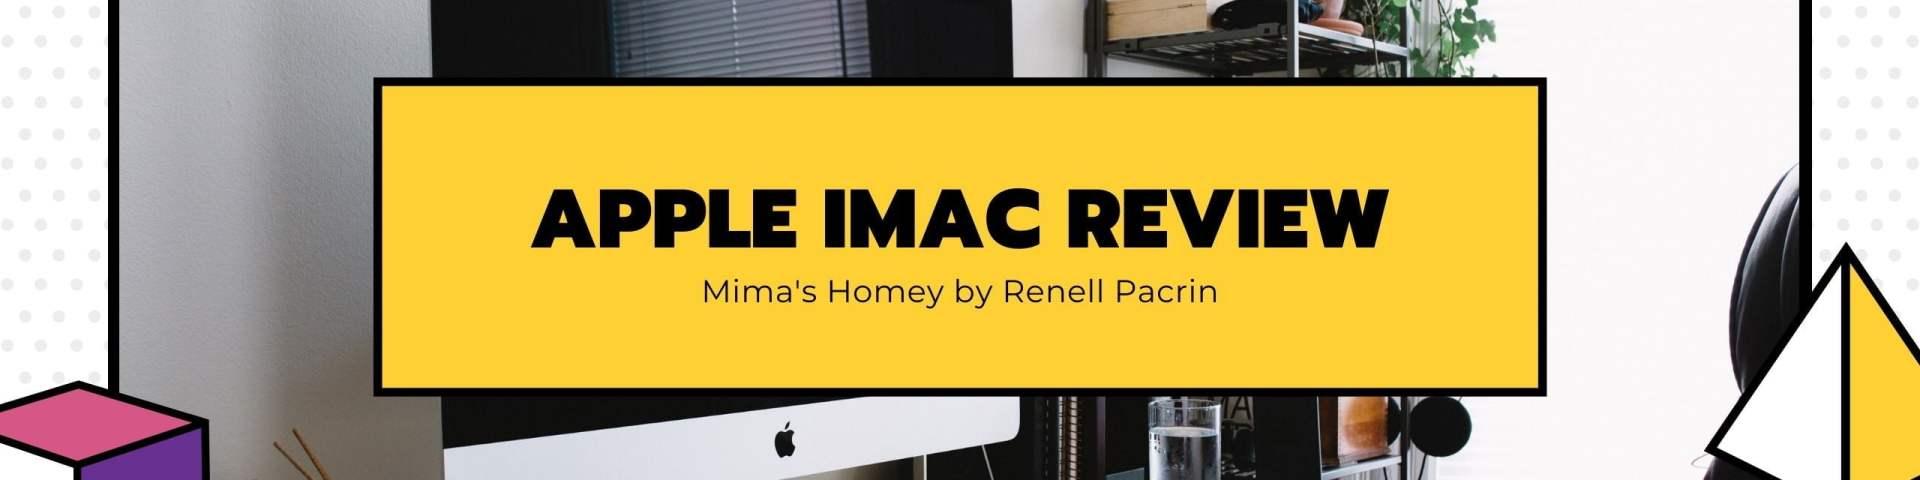 Apple iMac Review